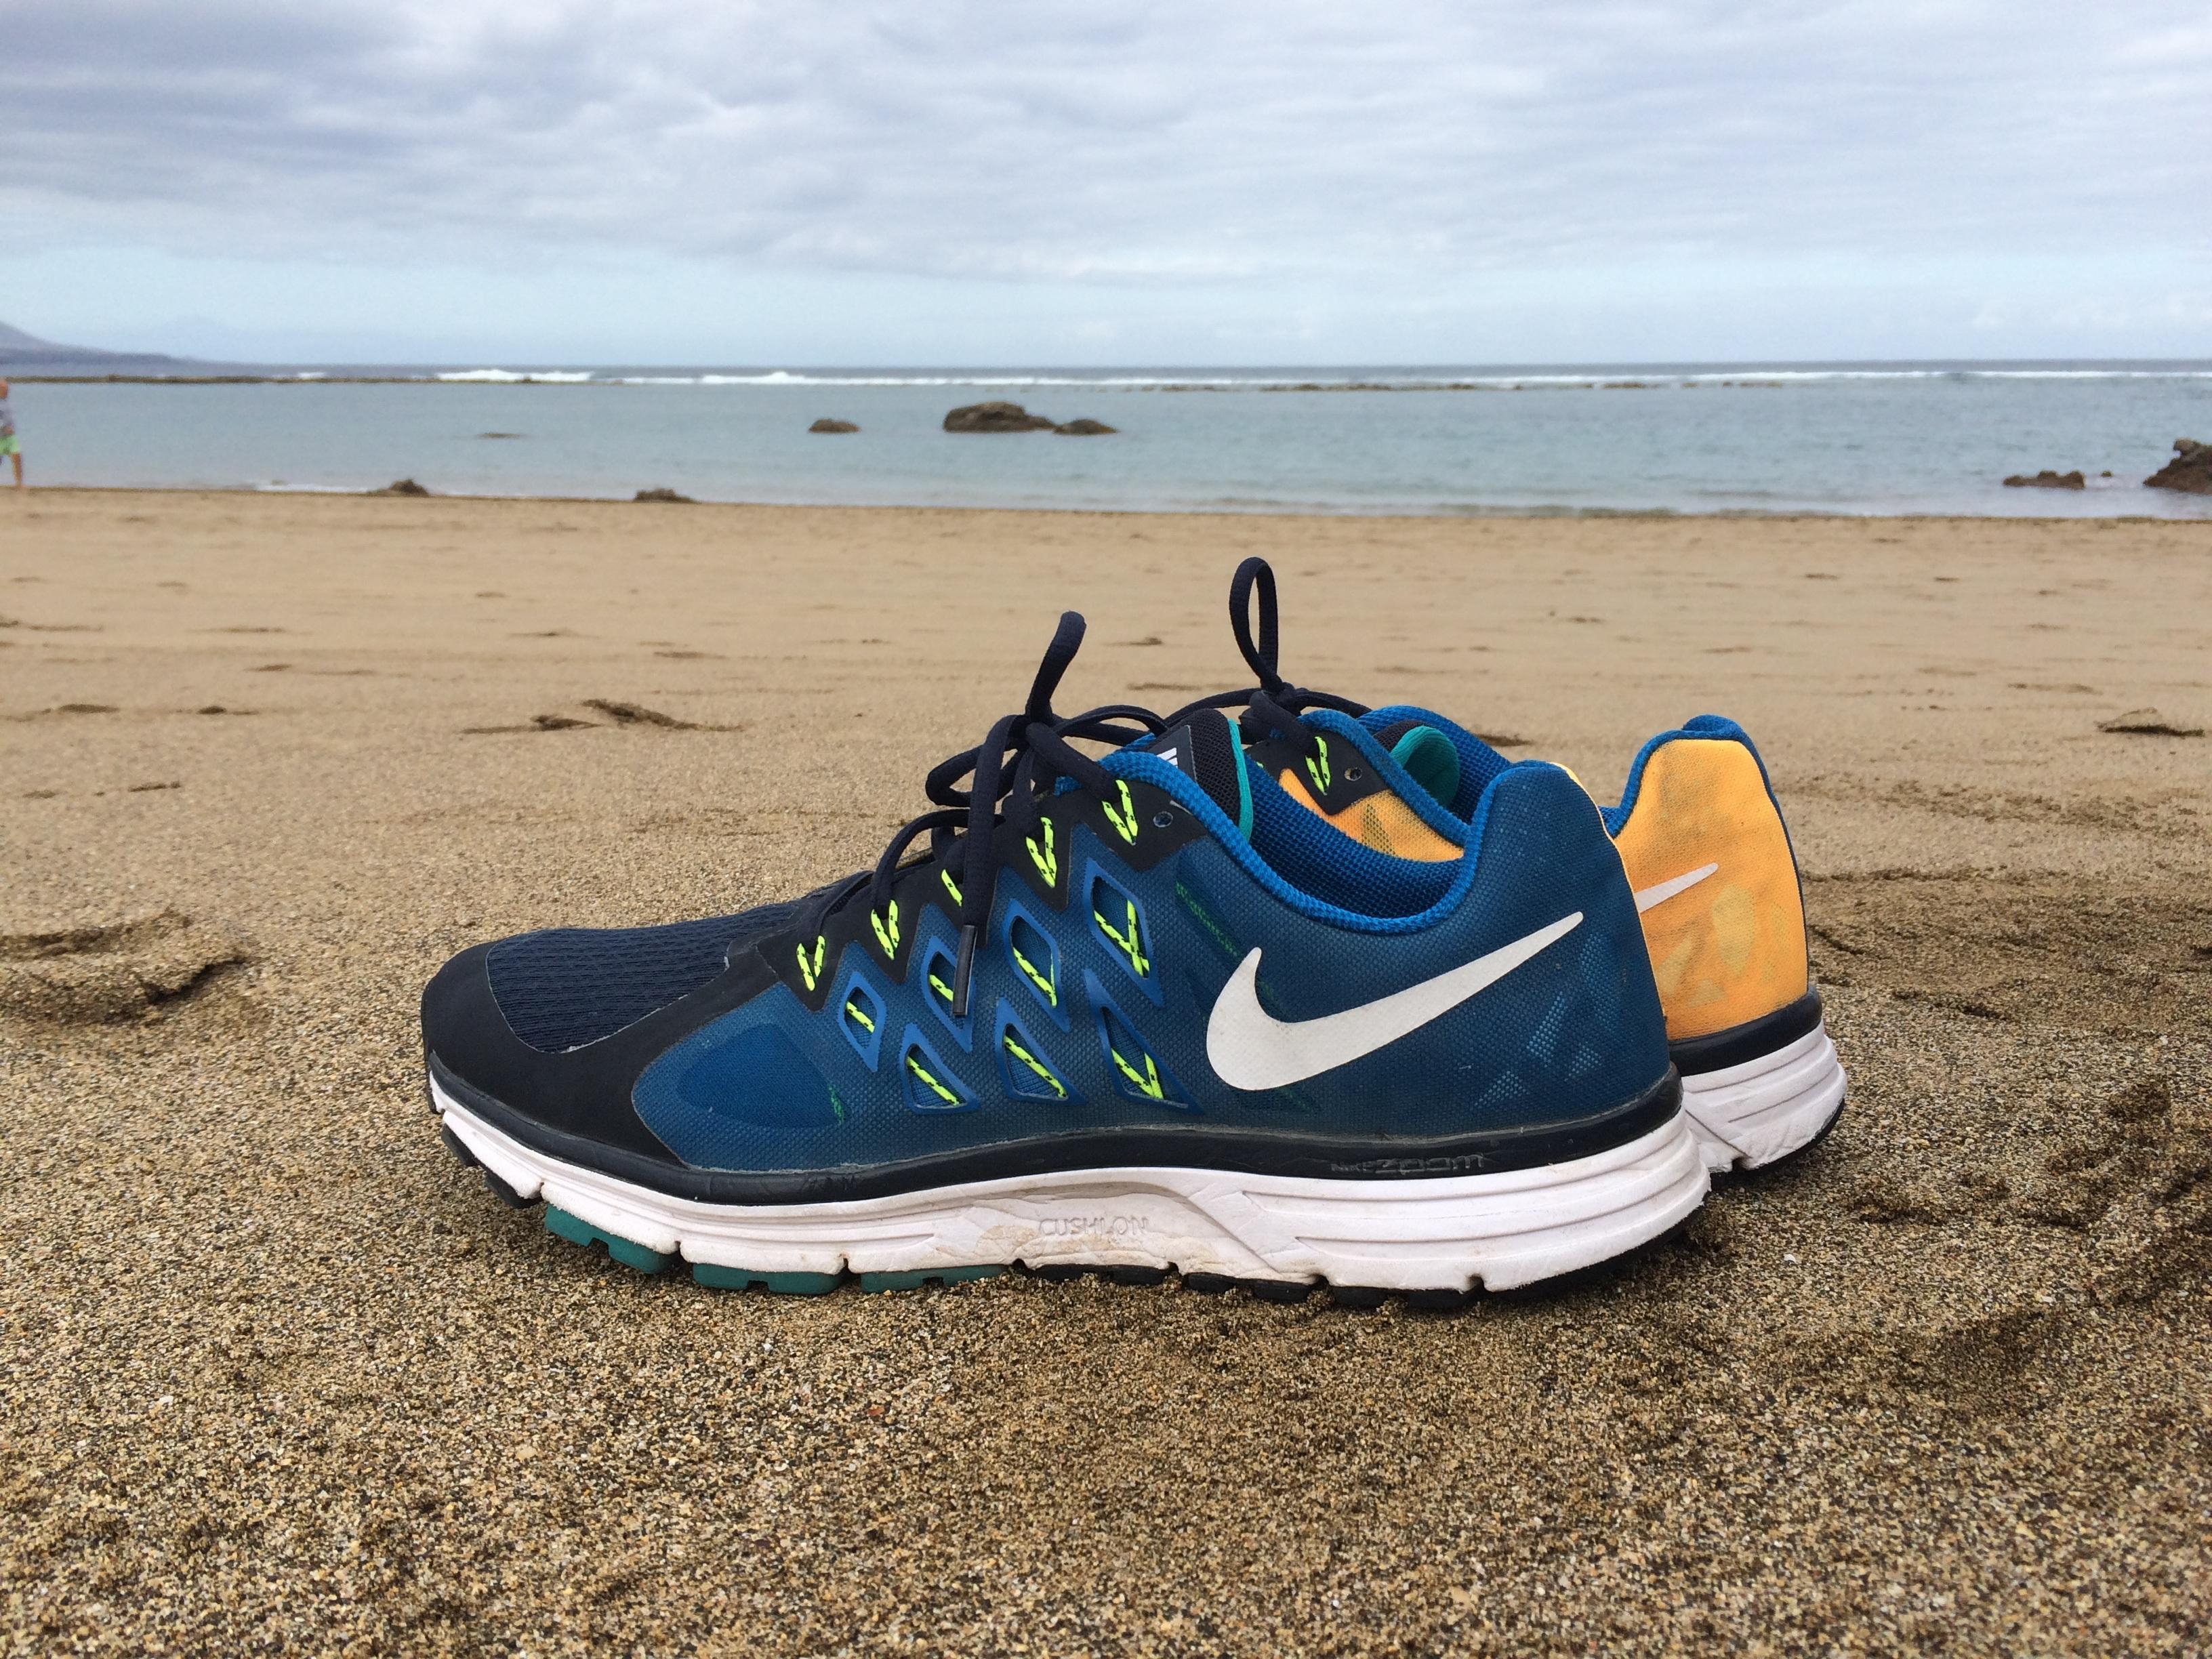 Schuhe strand meer